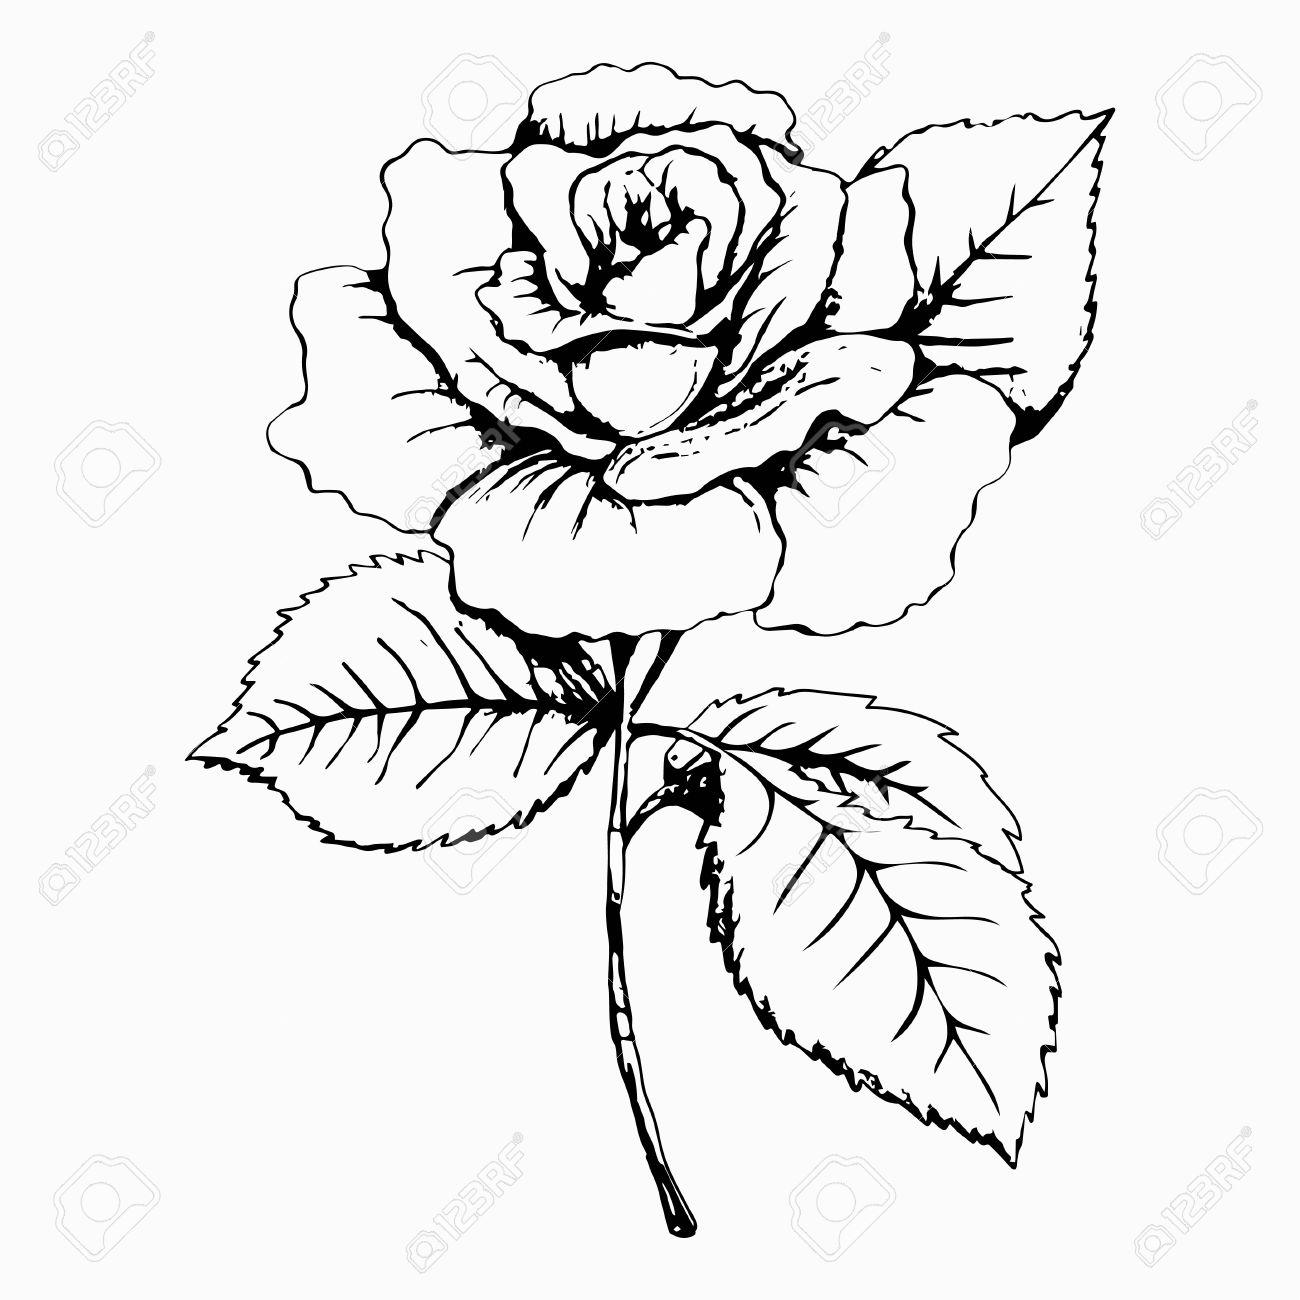 Fleur Rose Croquis Peinture Dessin A Main Levee Bourgeon Blanc